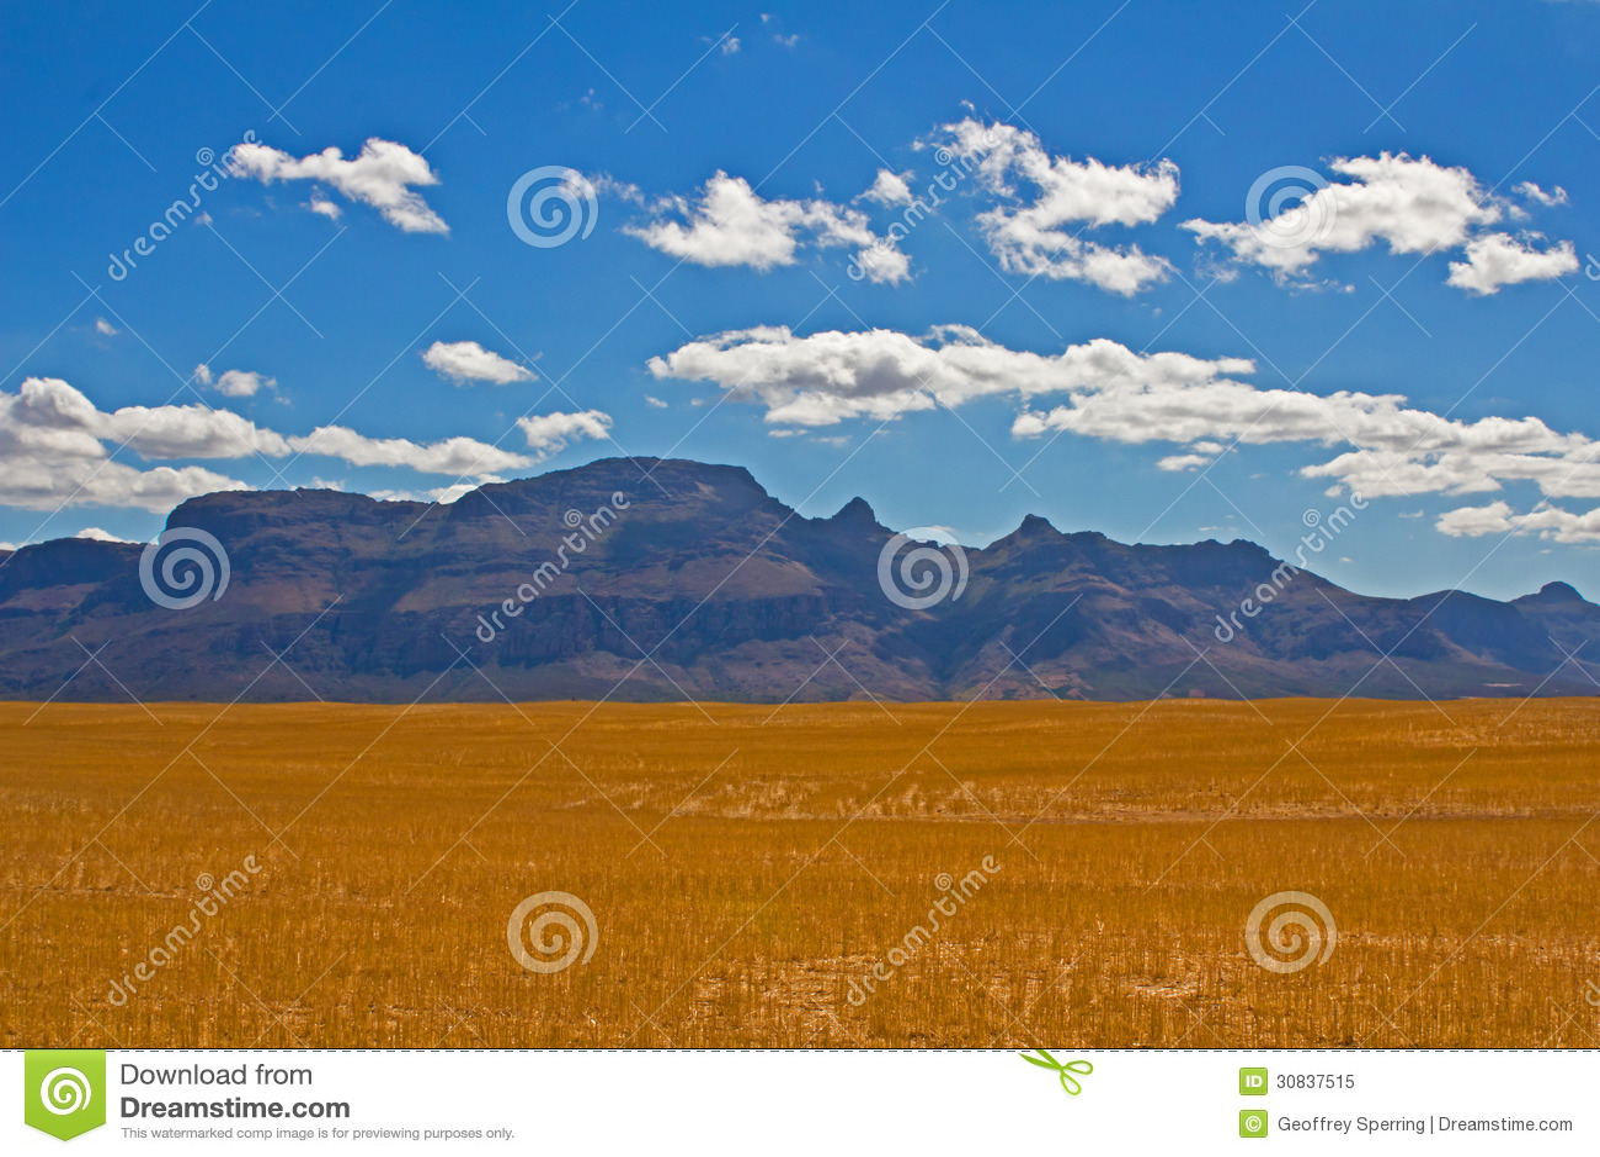 Piketbergberg over droog tarwegebied